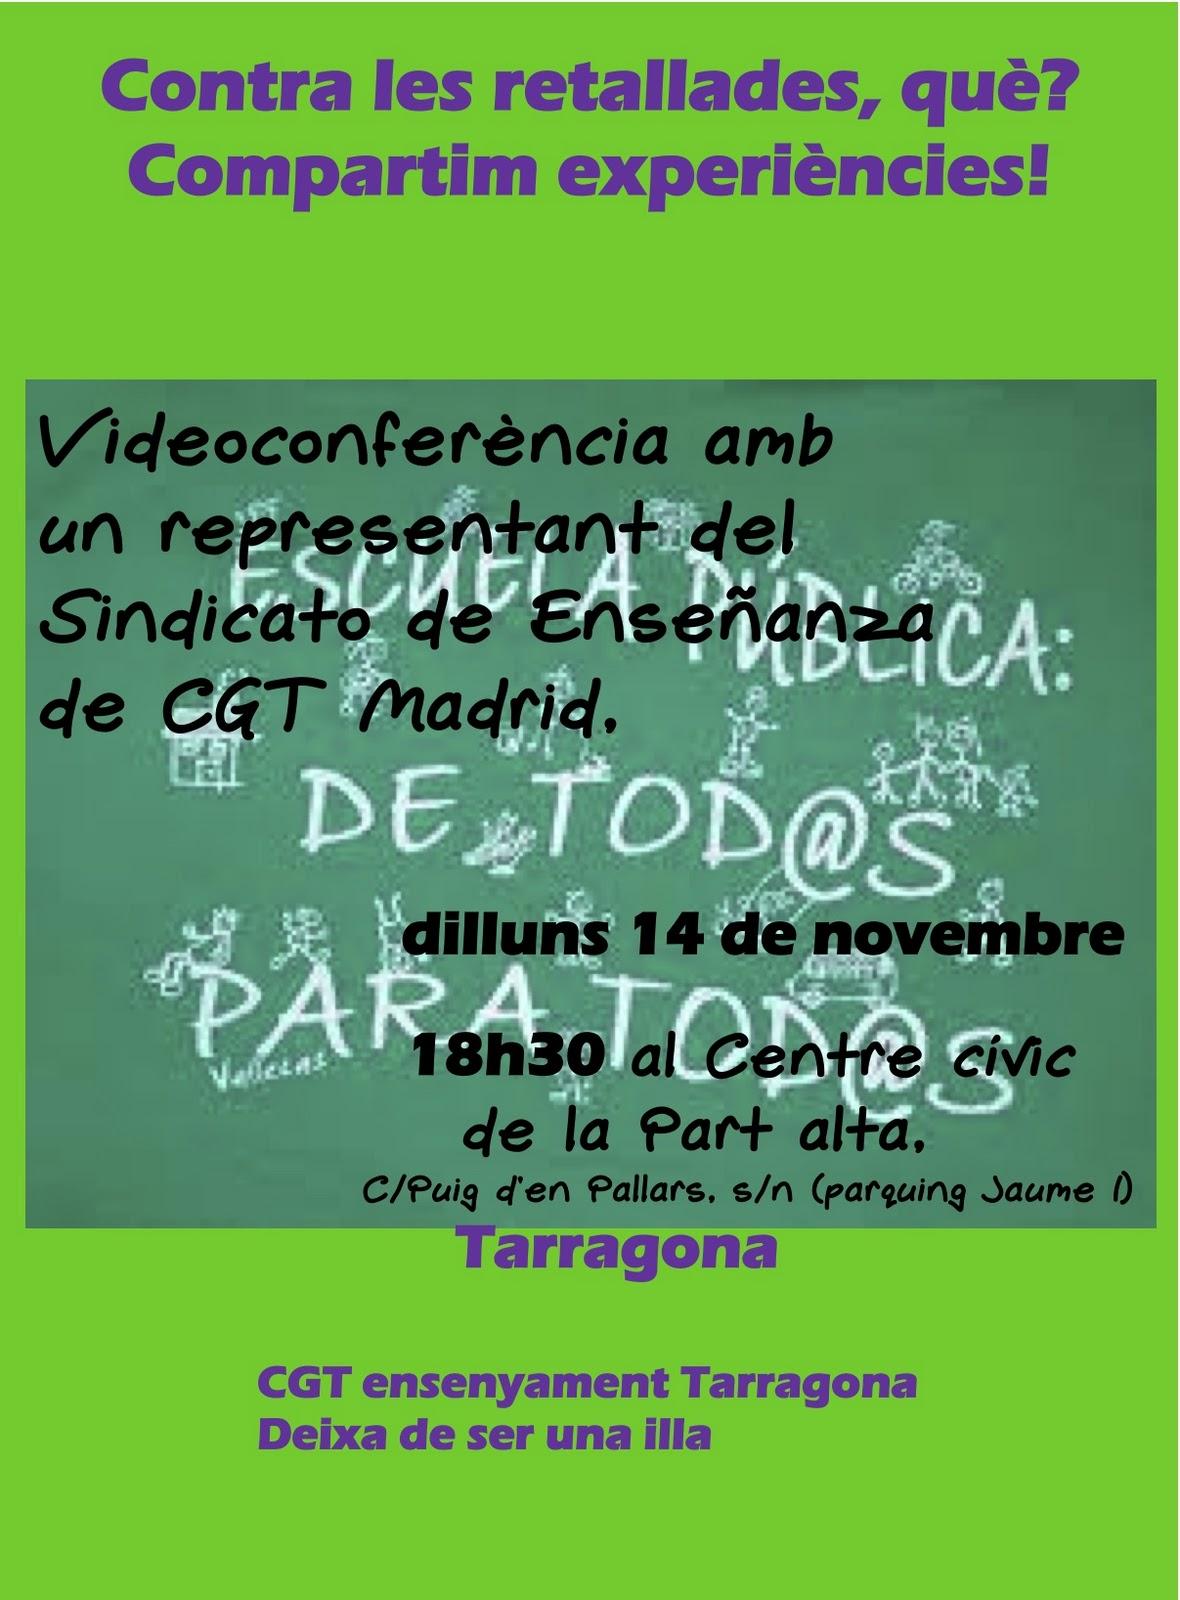 cartell videoconferencia